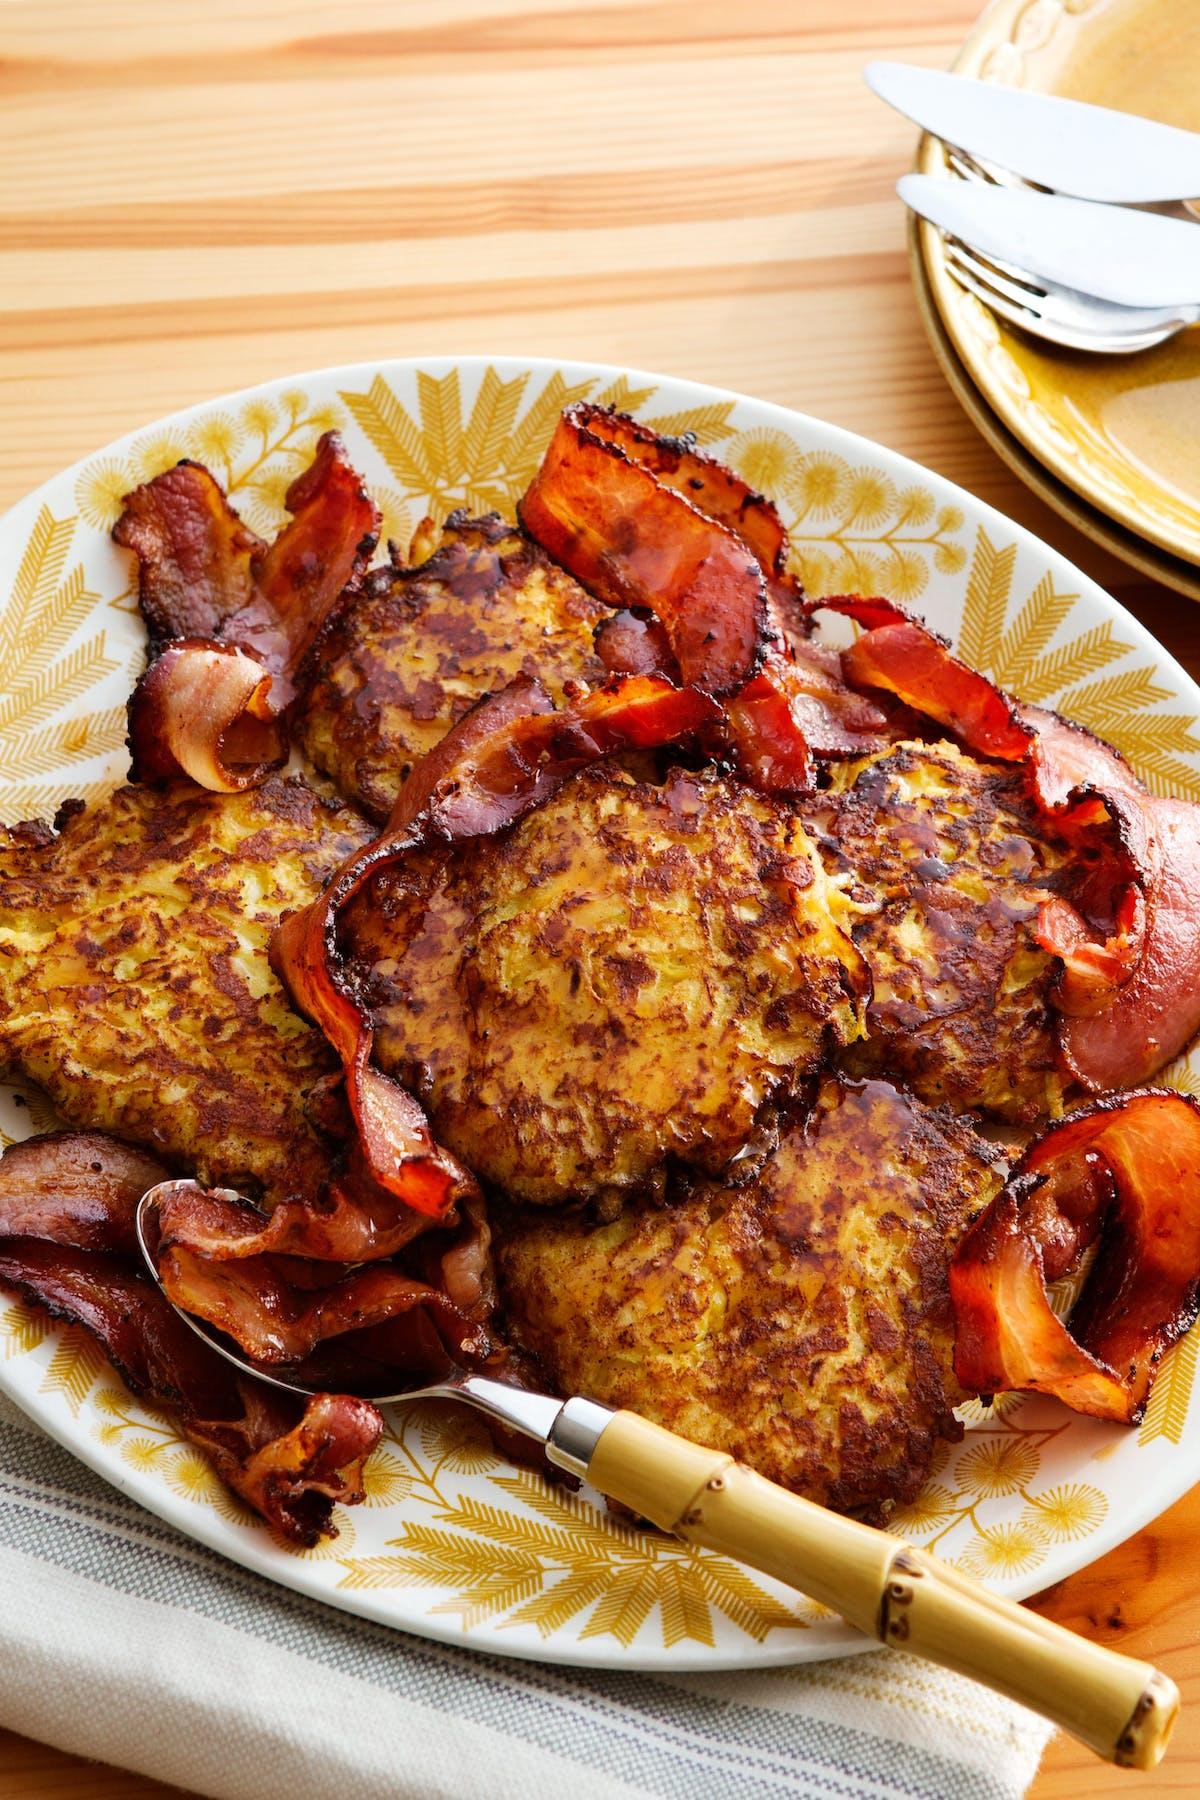 Frituras de colinabo low-carb con bacon